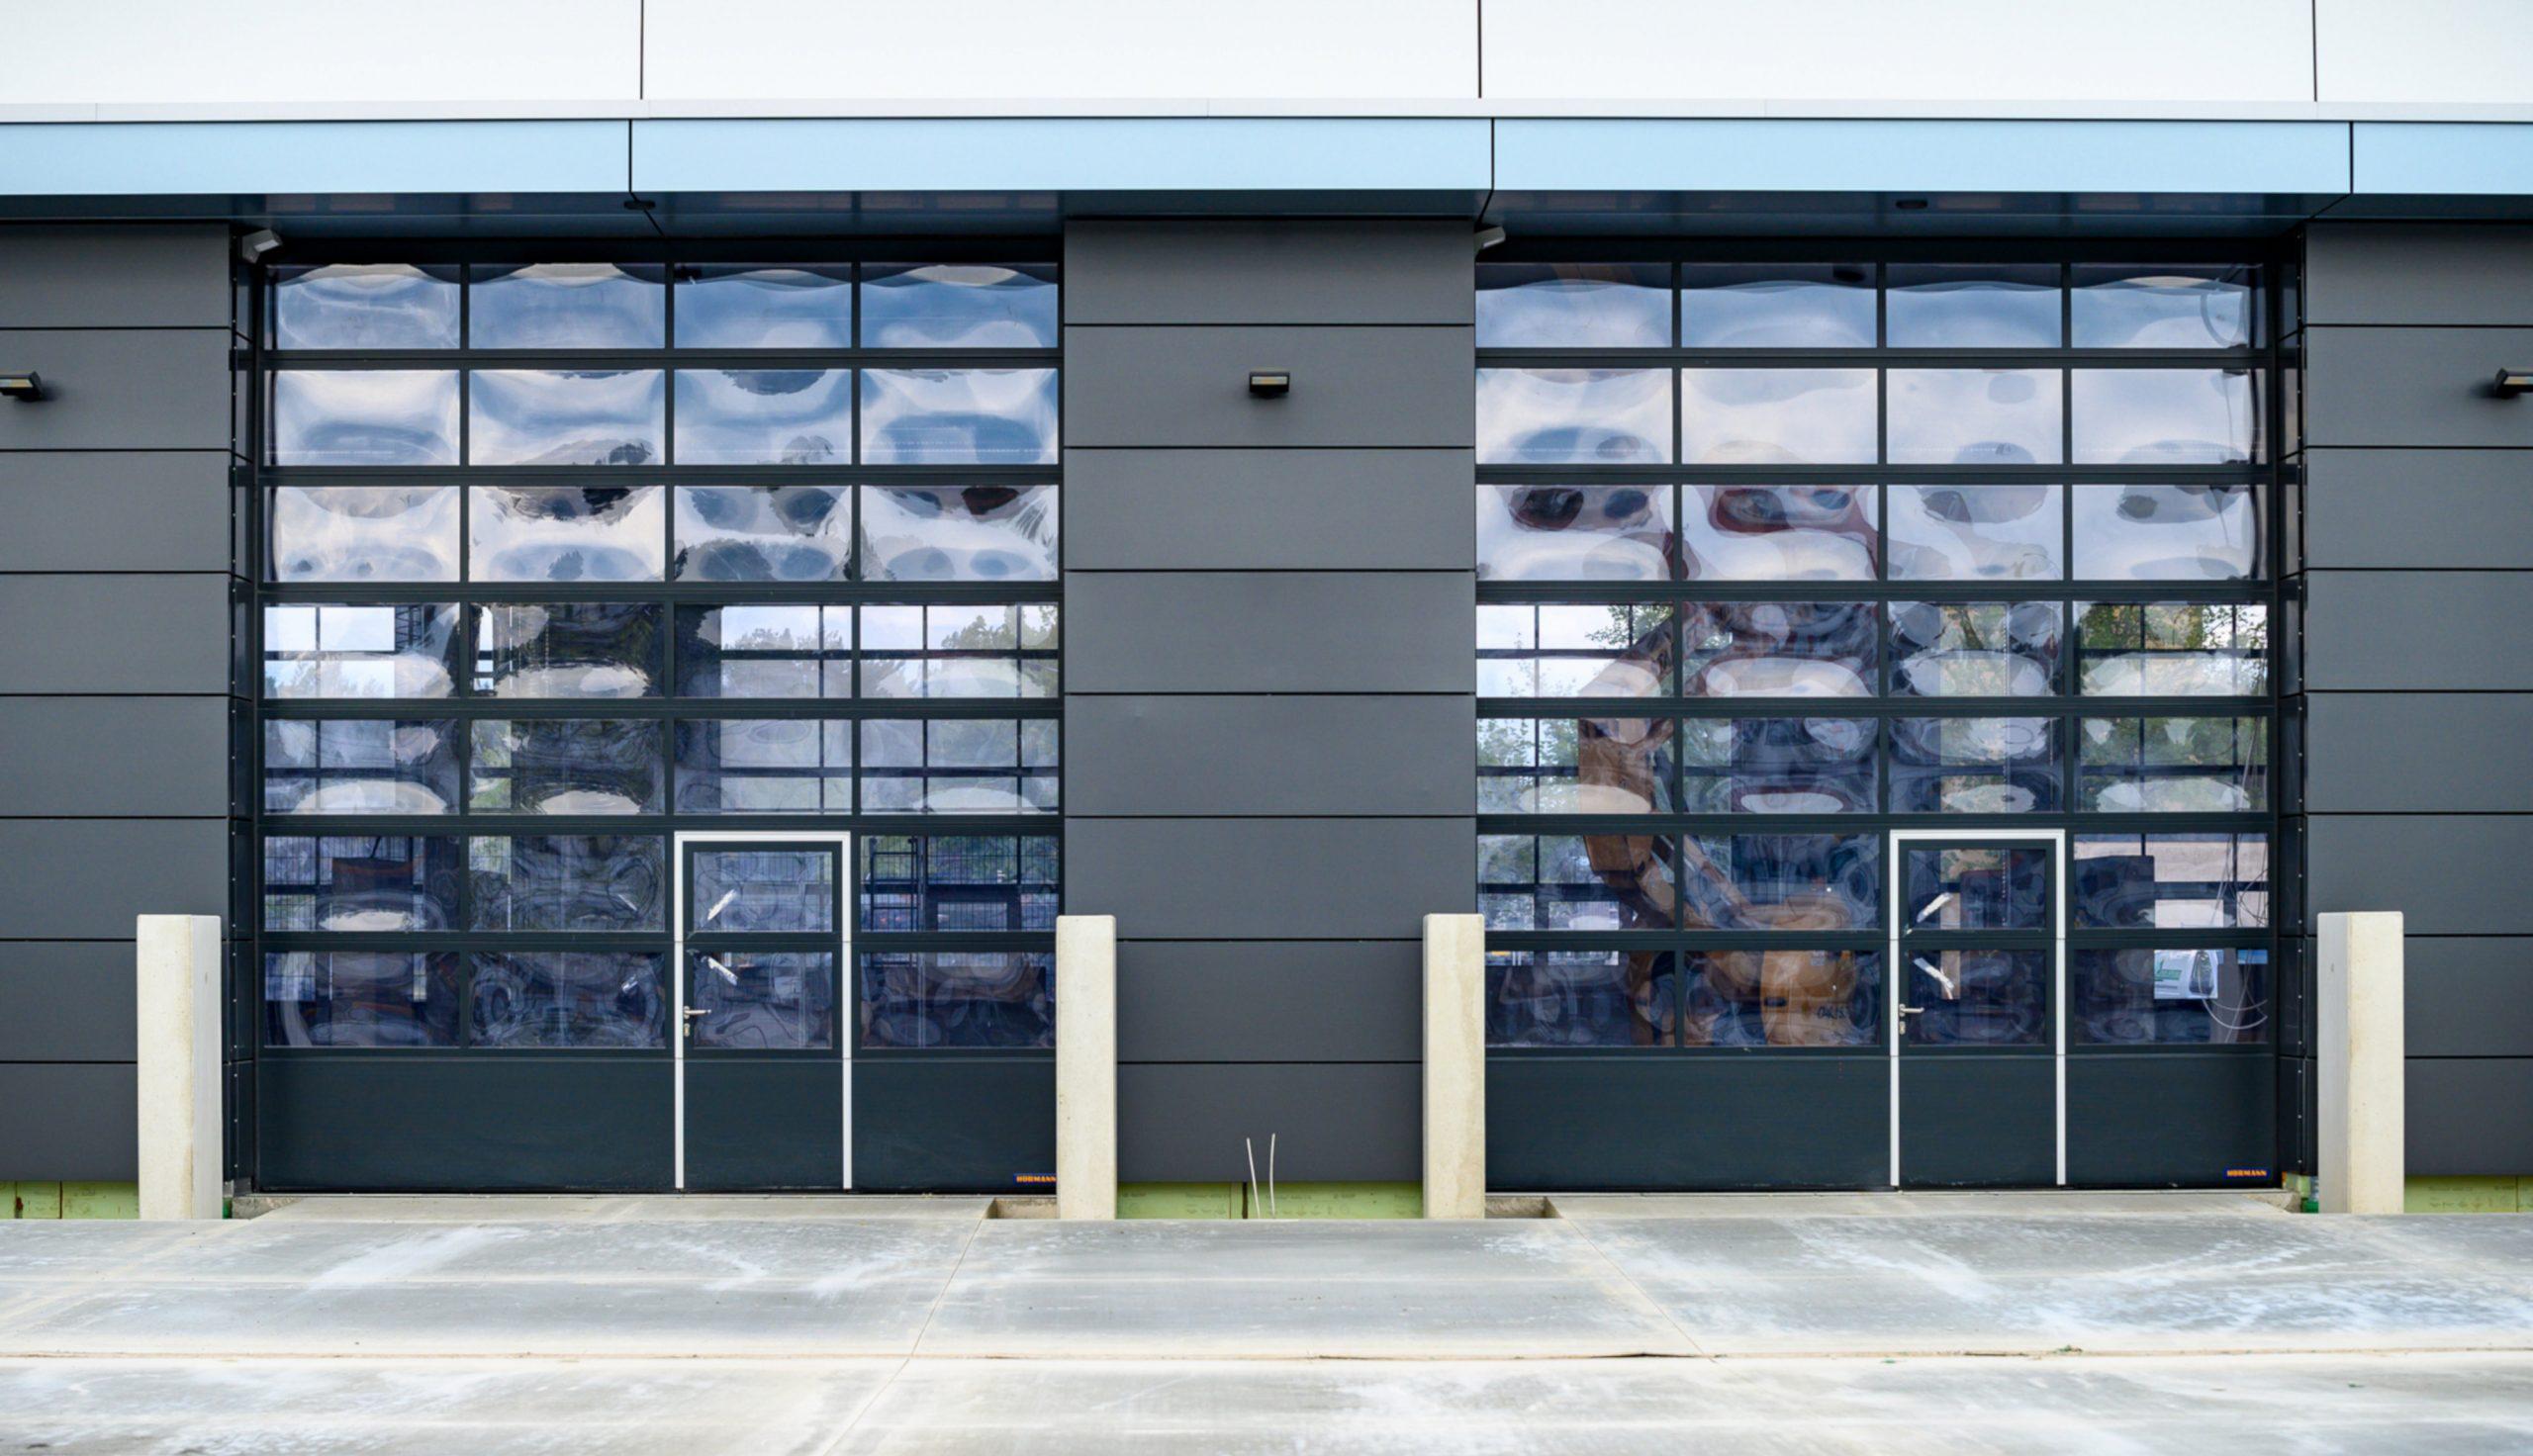 Projektbild 9, Kfz Instandsetzungshalle |  |  H.-J. Zieten Kaserne Beelitz